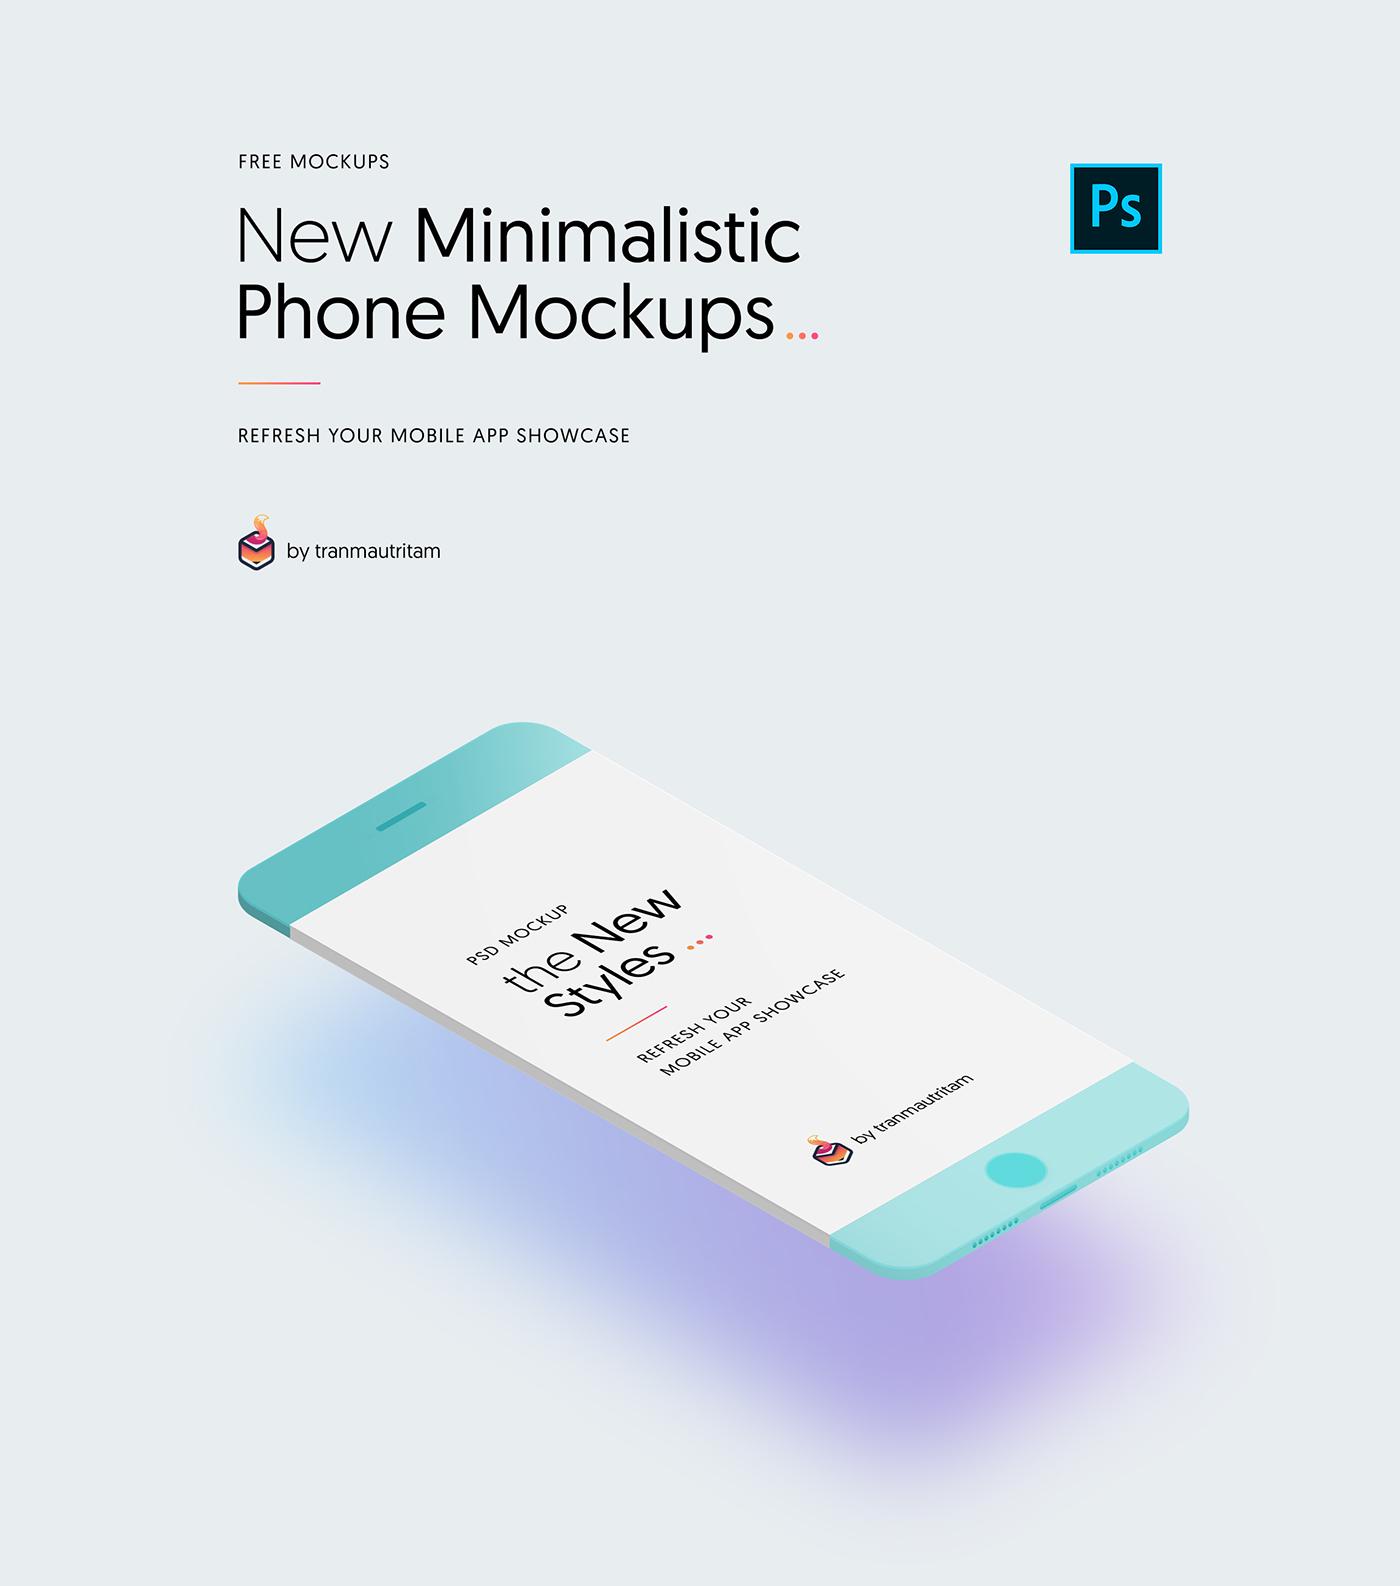 smart phone Mockup free free download iphone free mockup  mockups free iphone mockup UI minimal